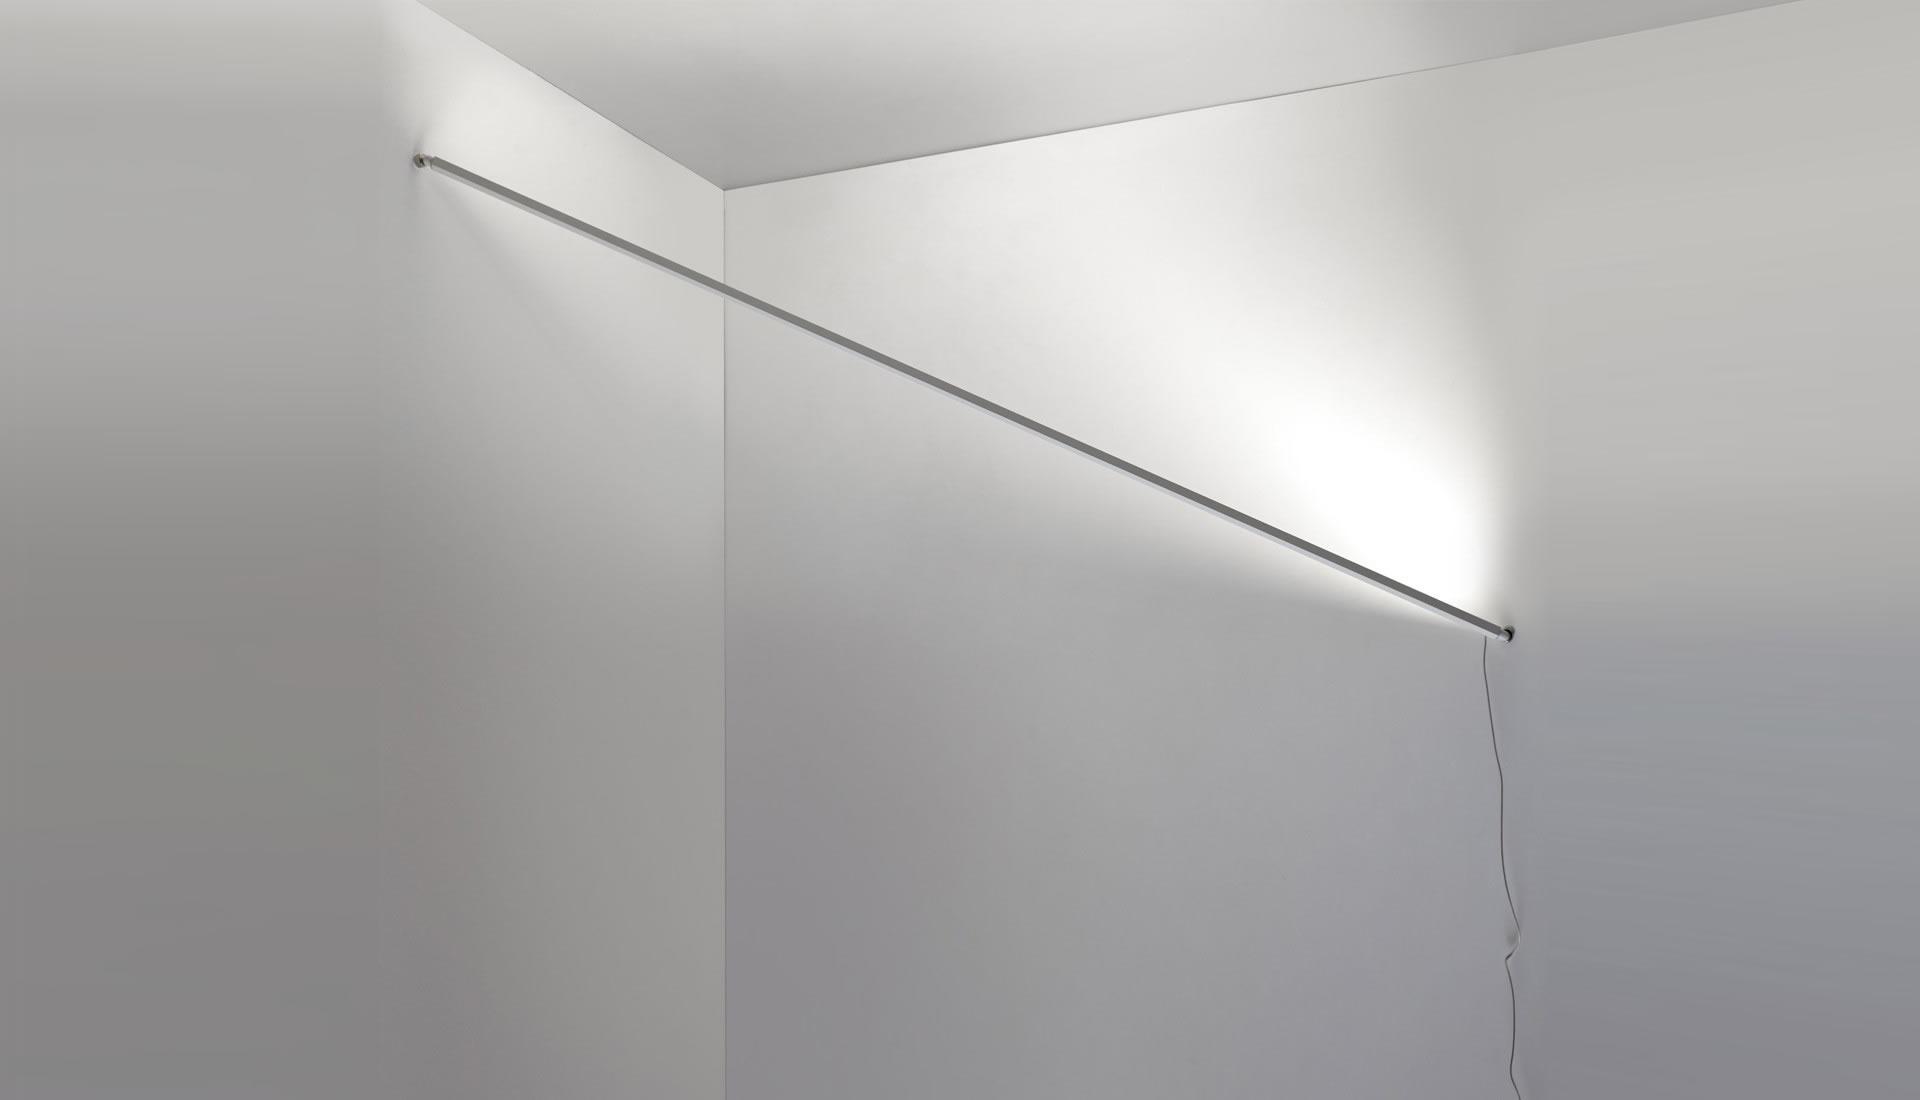 Flashit artemide lampada flashit artemide lampada da parete flashit artemide - Lampade parete artemide ...